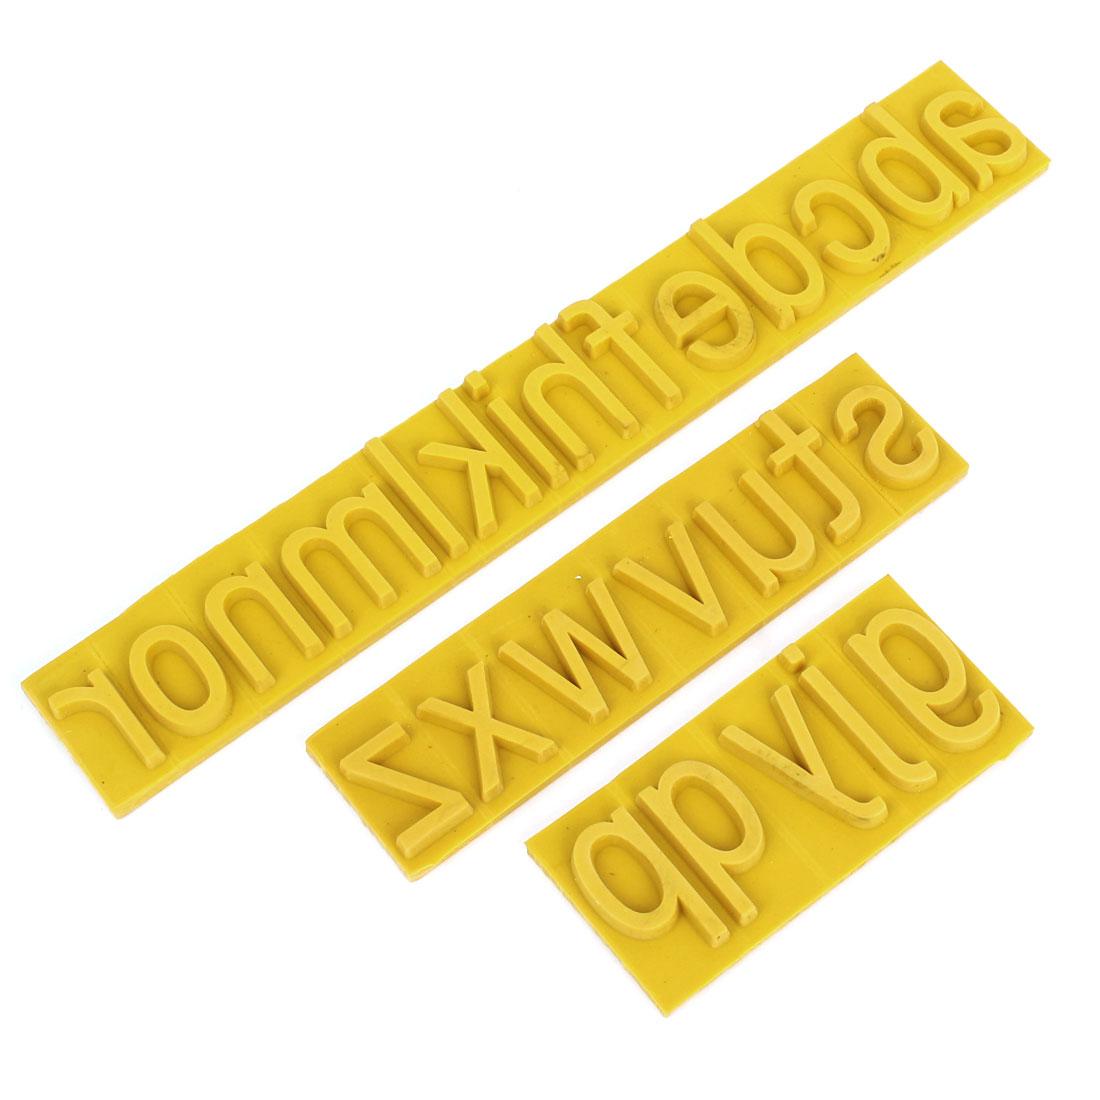 "1"" Lowercase Letter Rubber Stamp Coder Sets for Roller Printer"